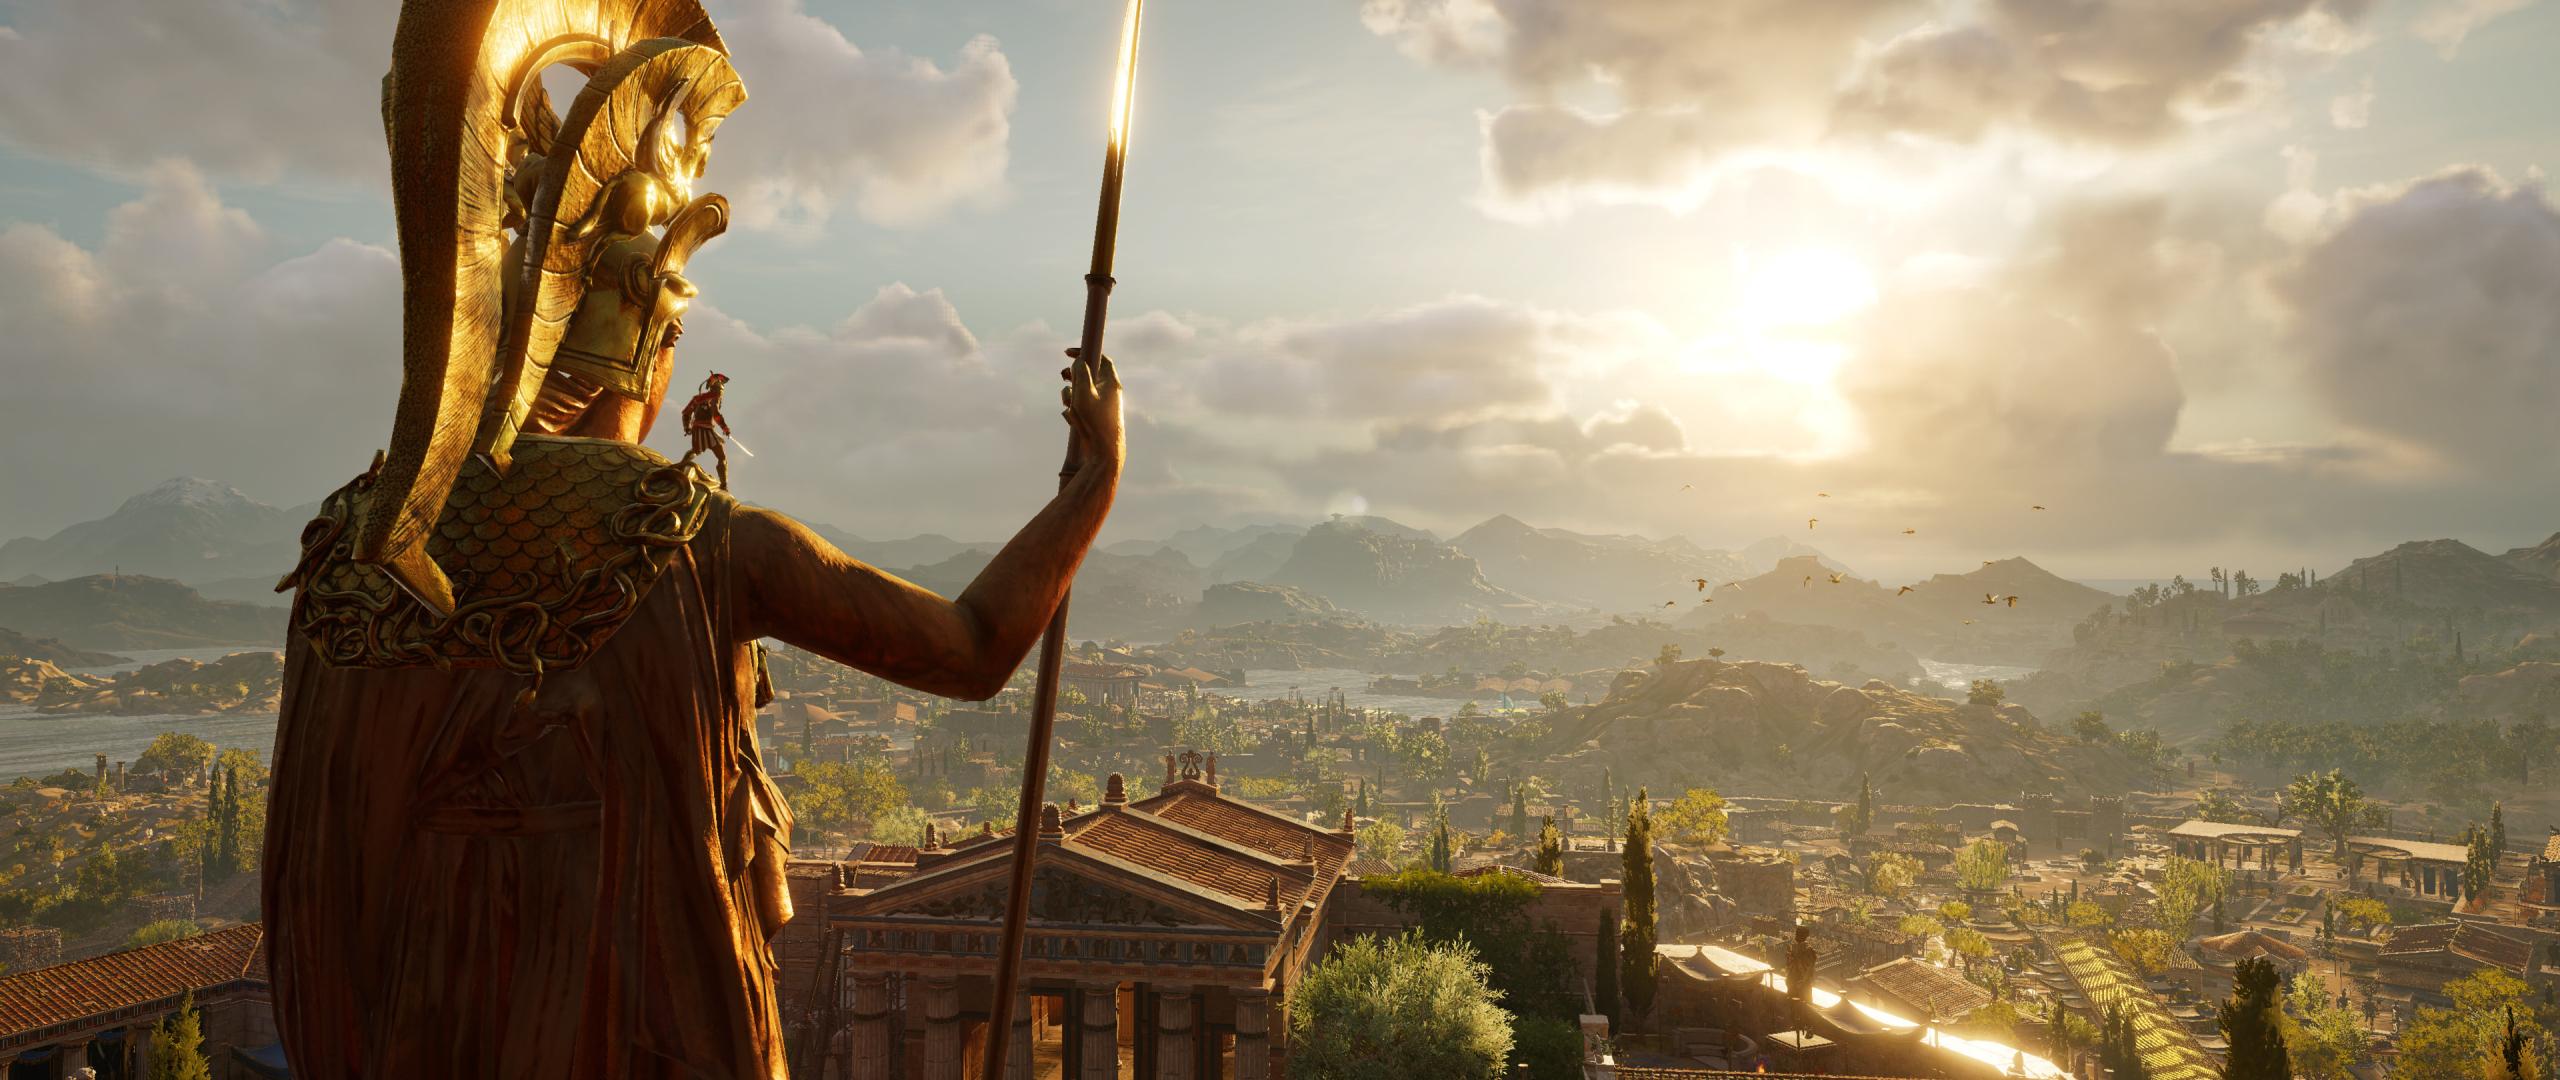 Assassin S Creed Odyssey Hd 4k Wallpaper